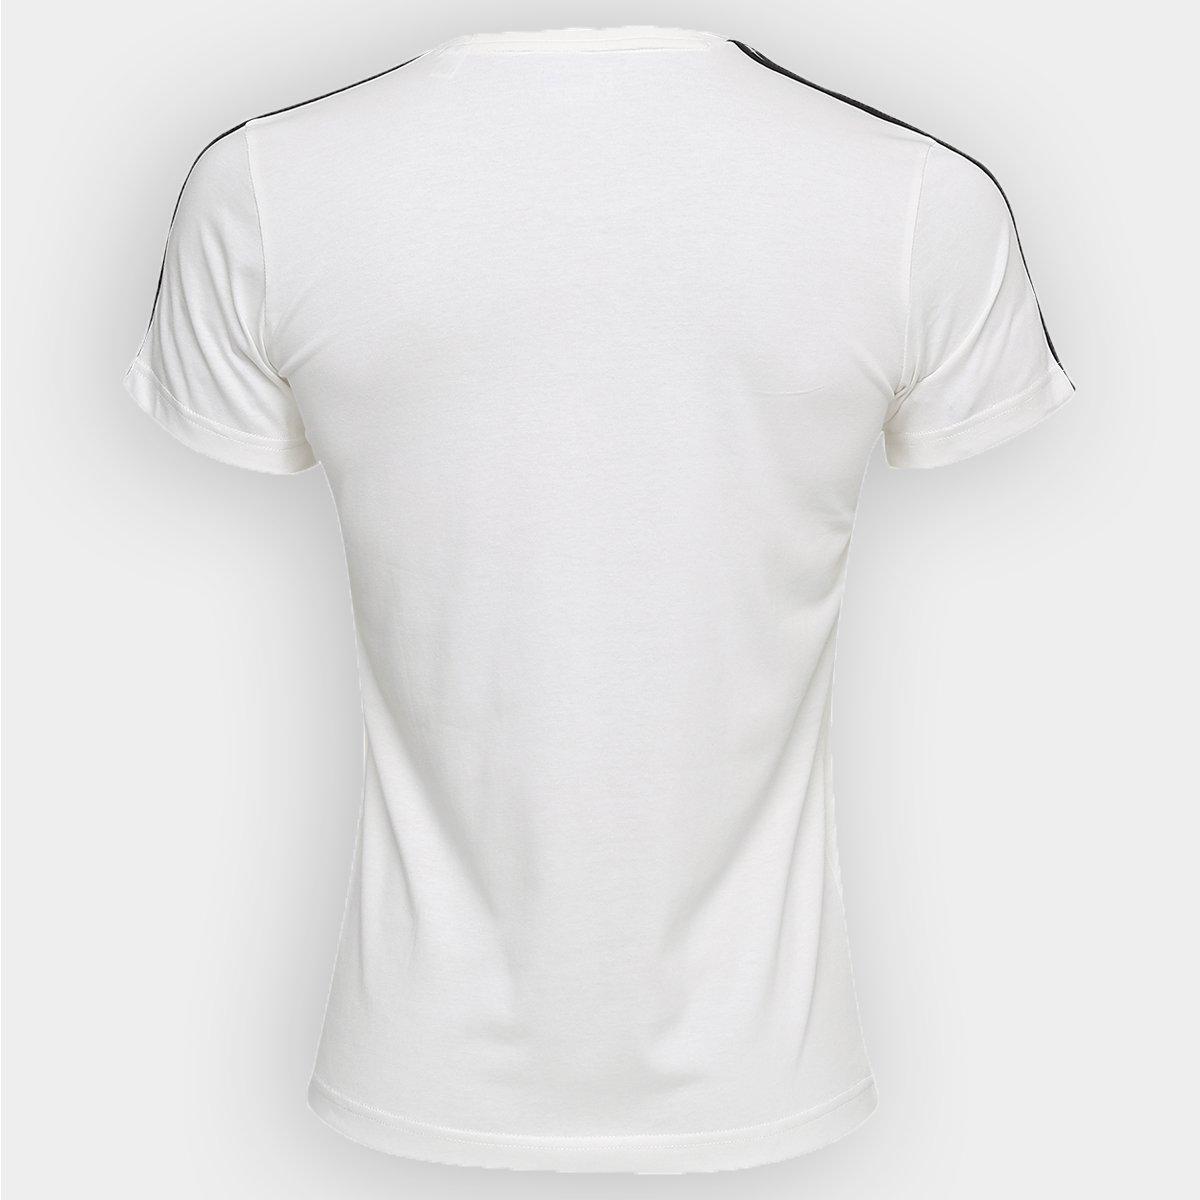 12bc523eda Camiseta Alemanha Adidas Retrô Masculina  Camiseta Alemanha Adidas Retrô  Masculina ...